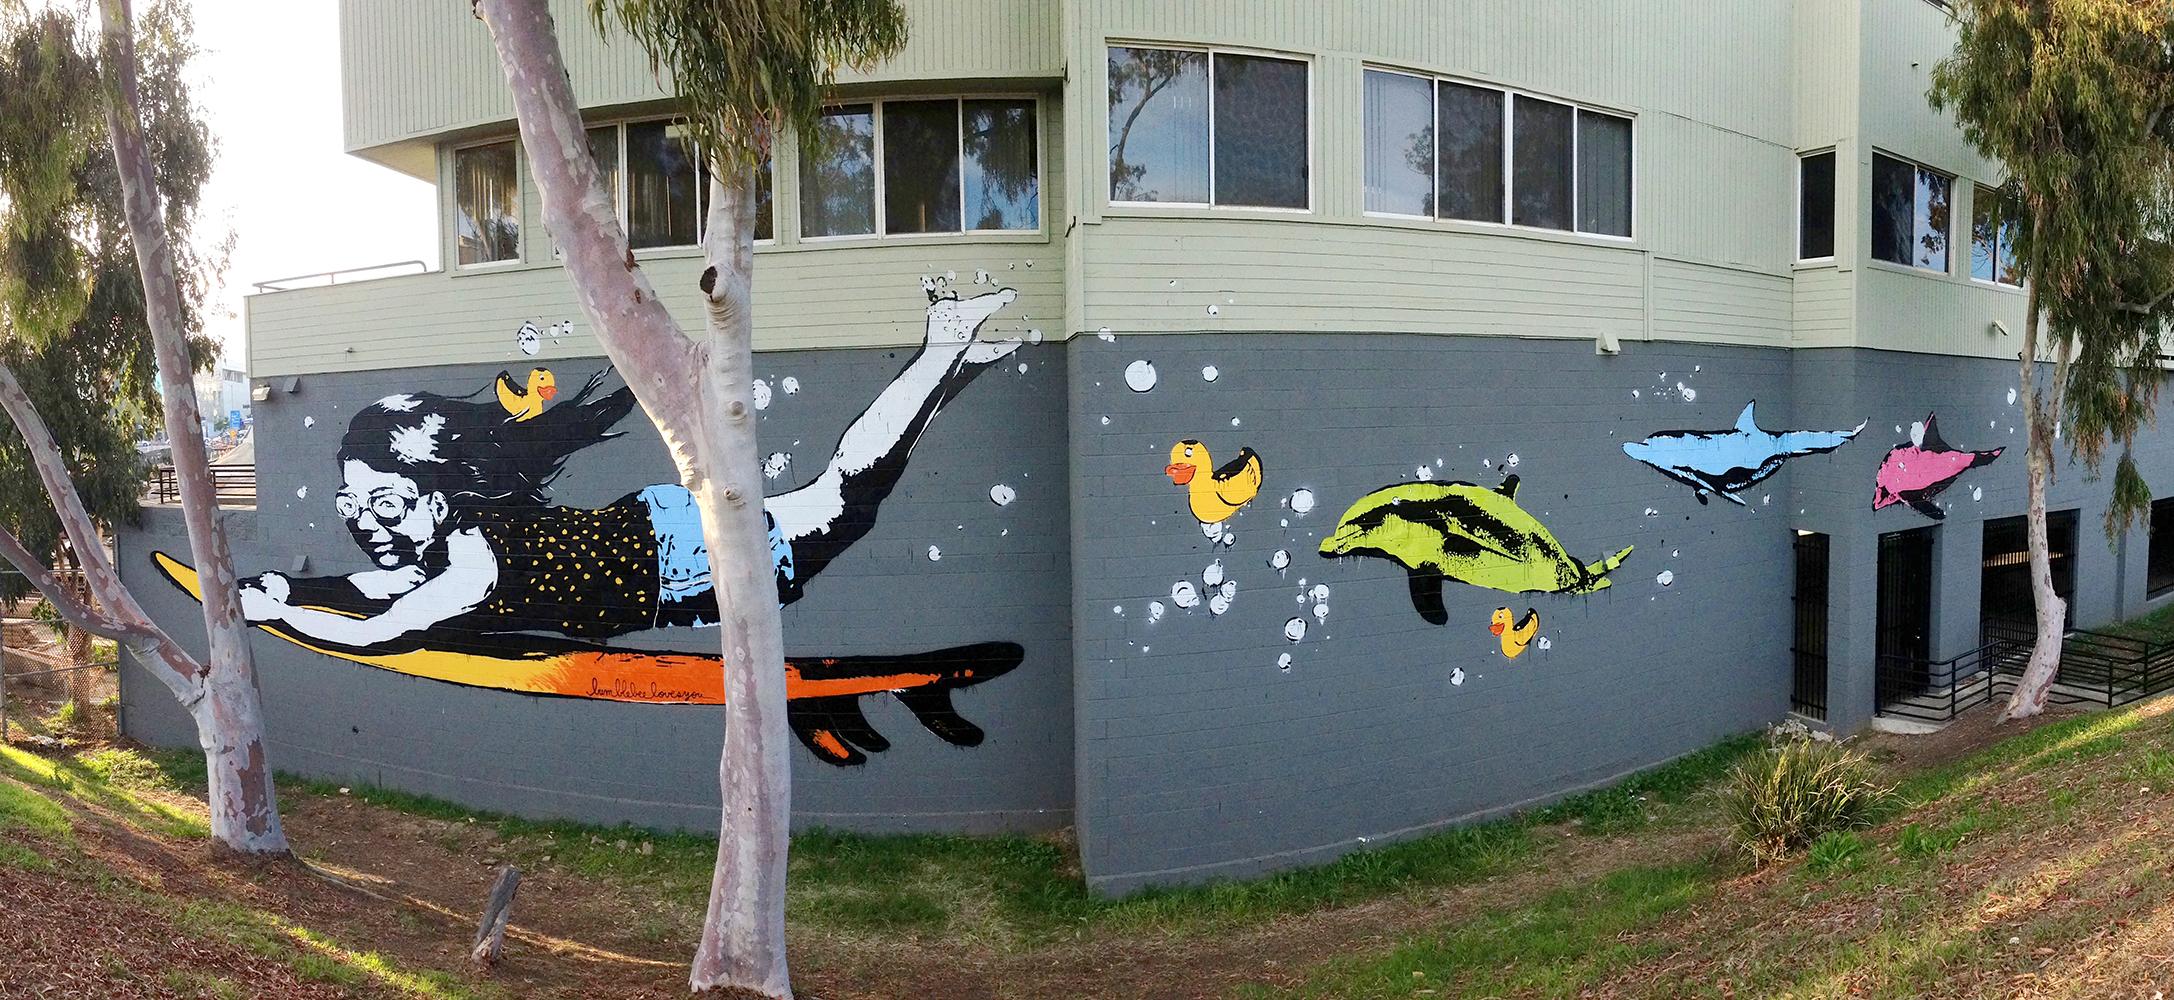 'Duck Dive' Santa Monica, CA 2014 - Bumblebeelovesyou